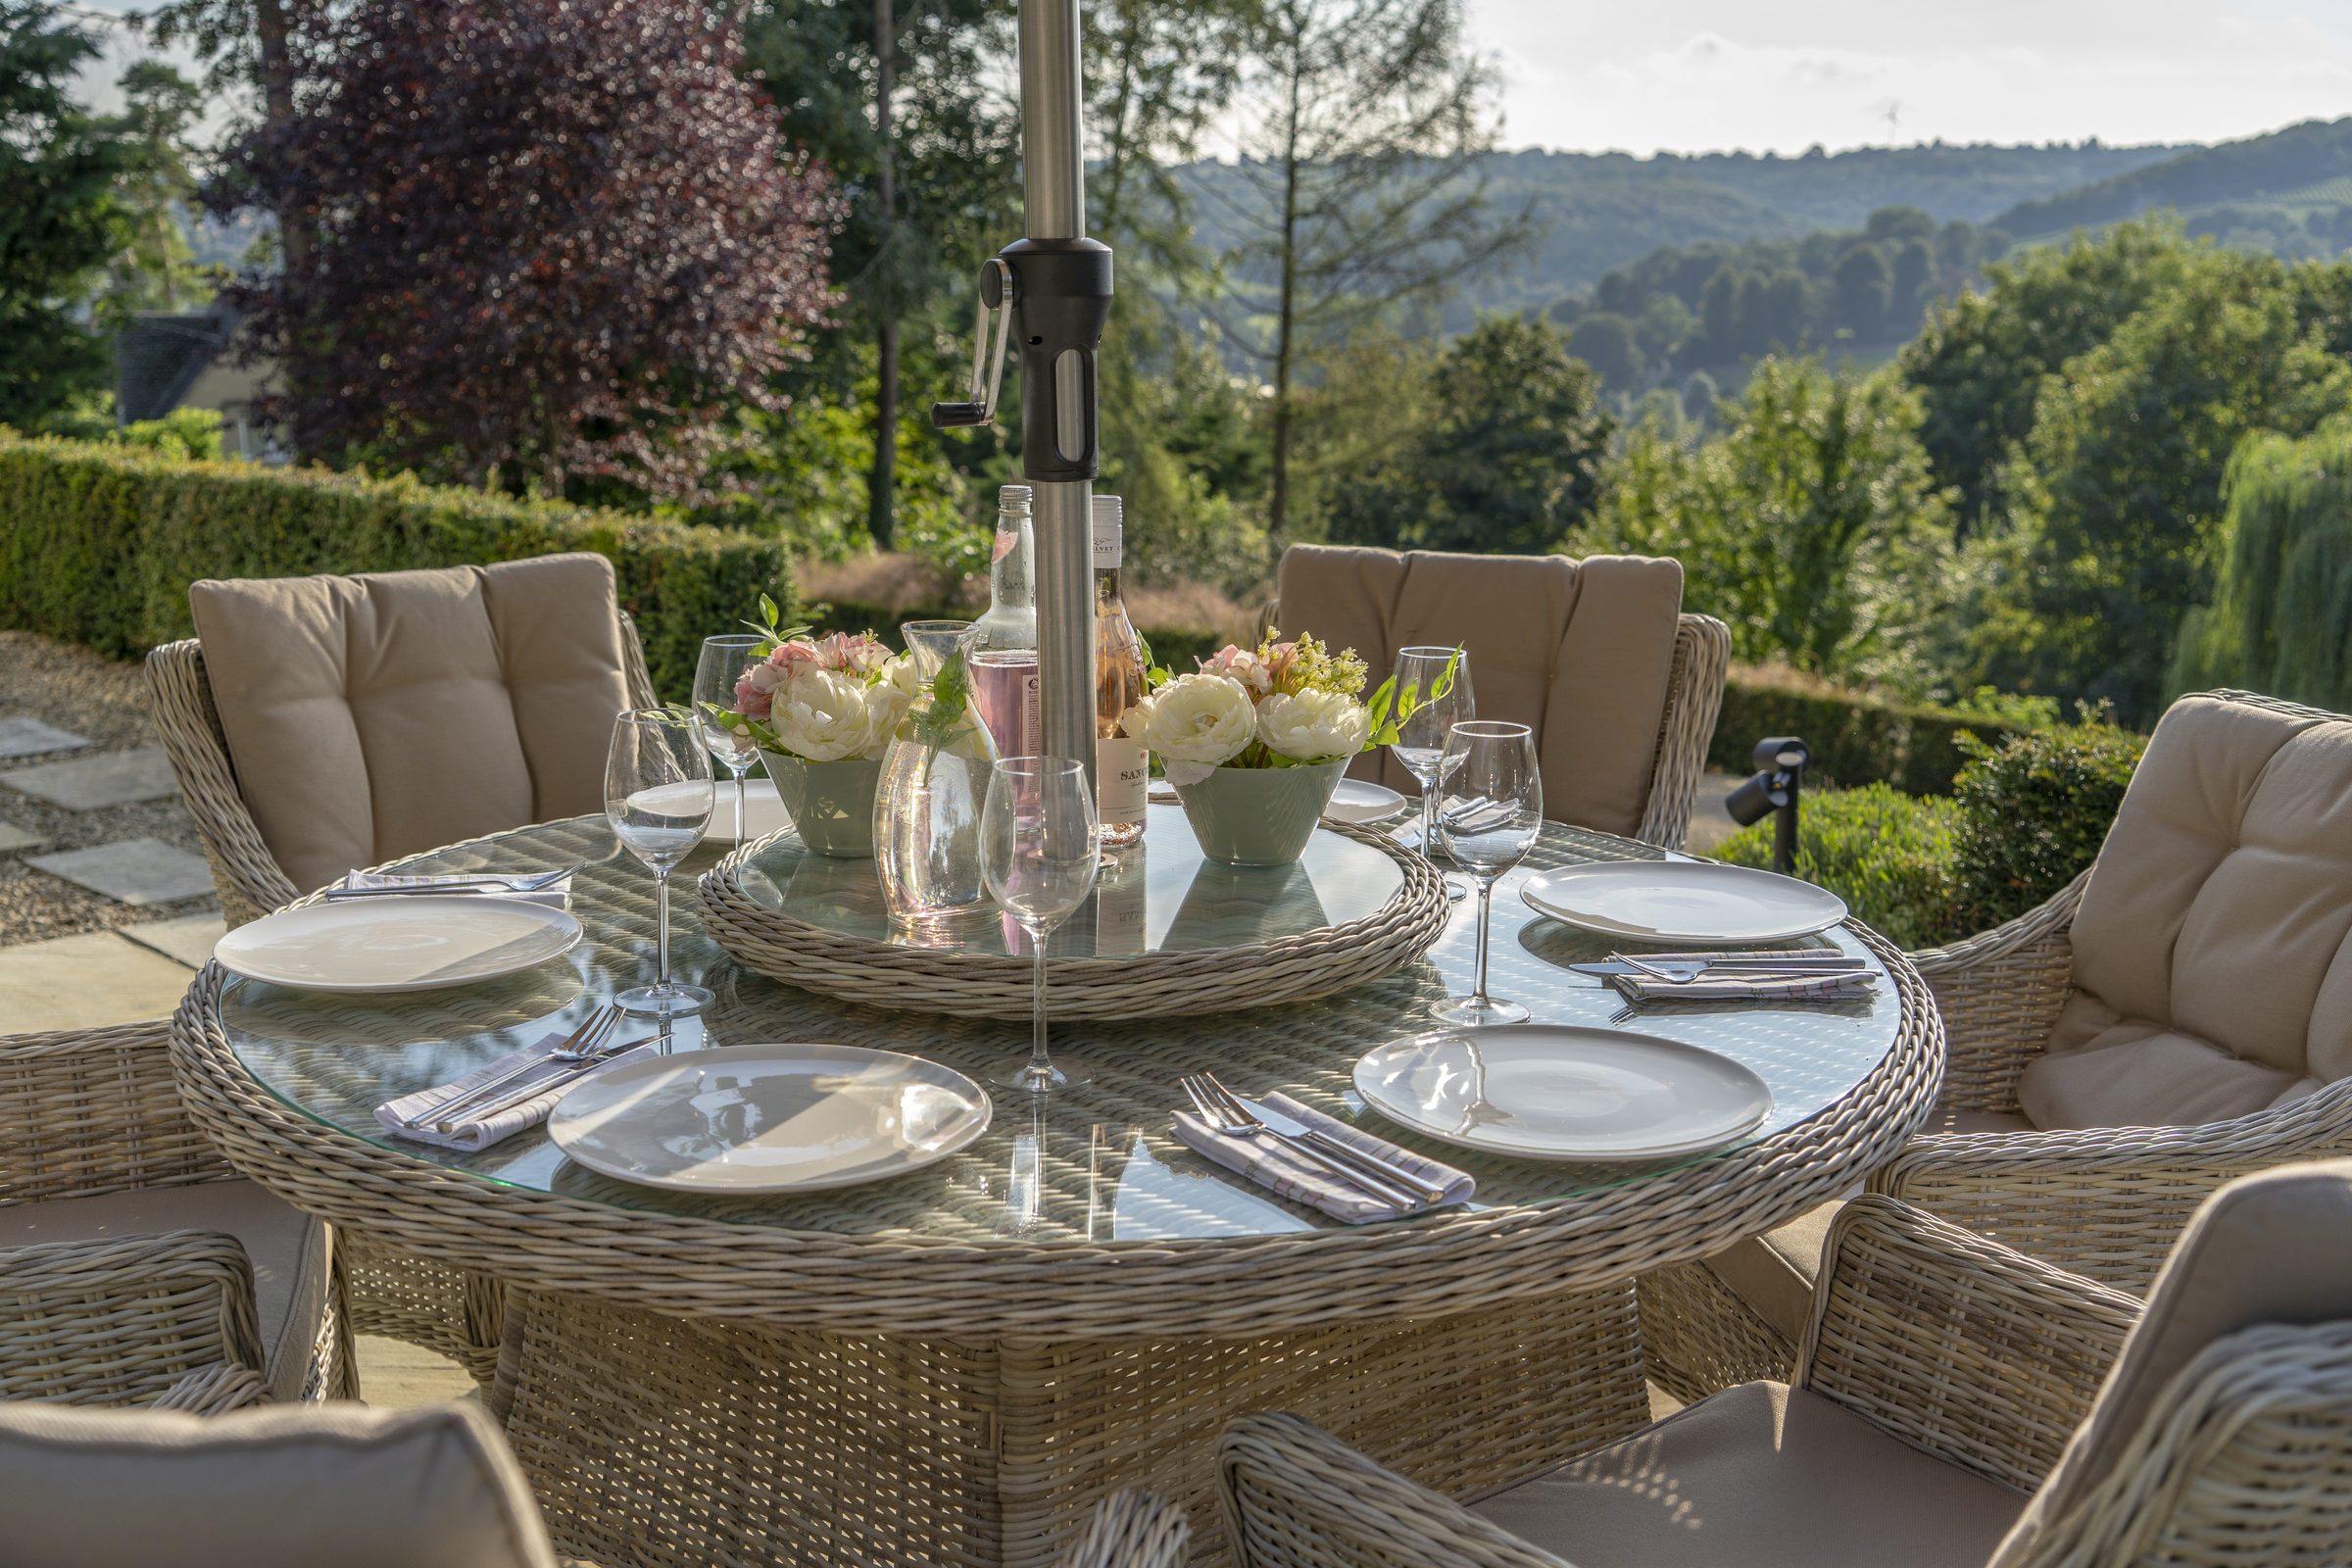 bramblecrest ascot 6 seat round table dining set 2019. Black Bedroom Furniture Sets. Home Design Ideas